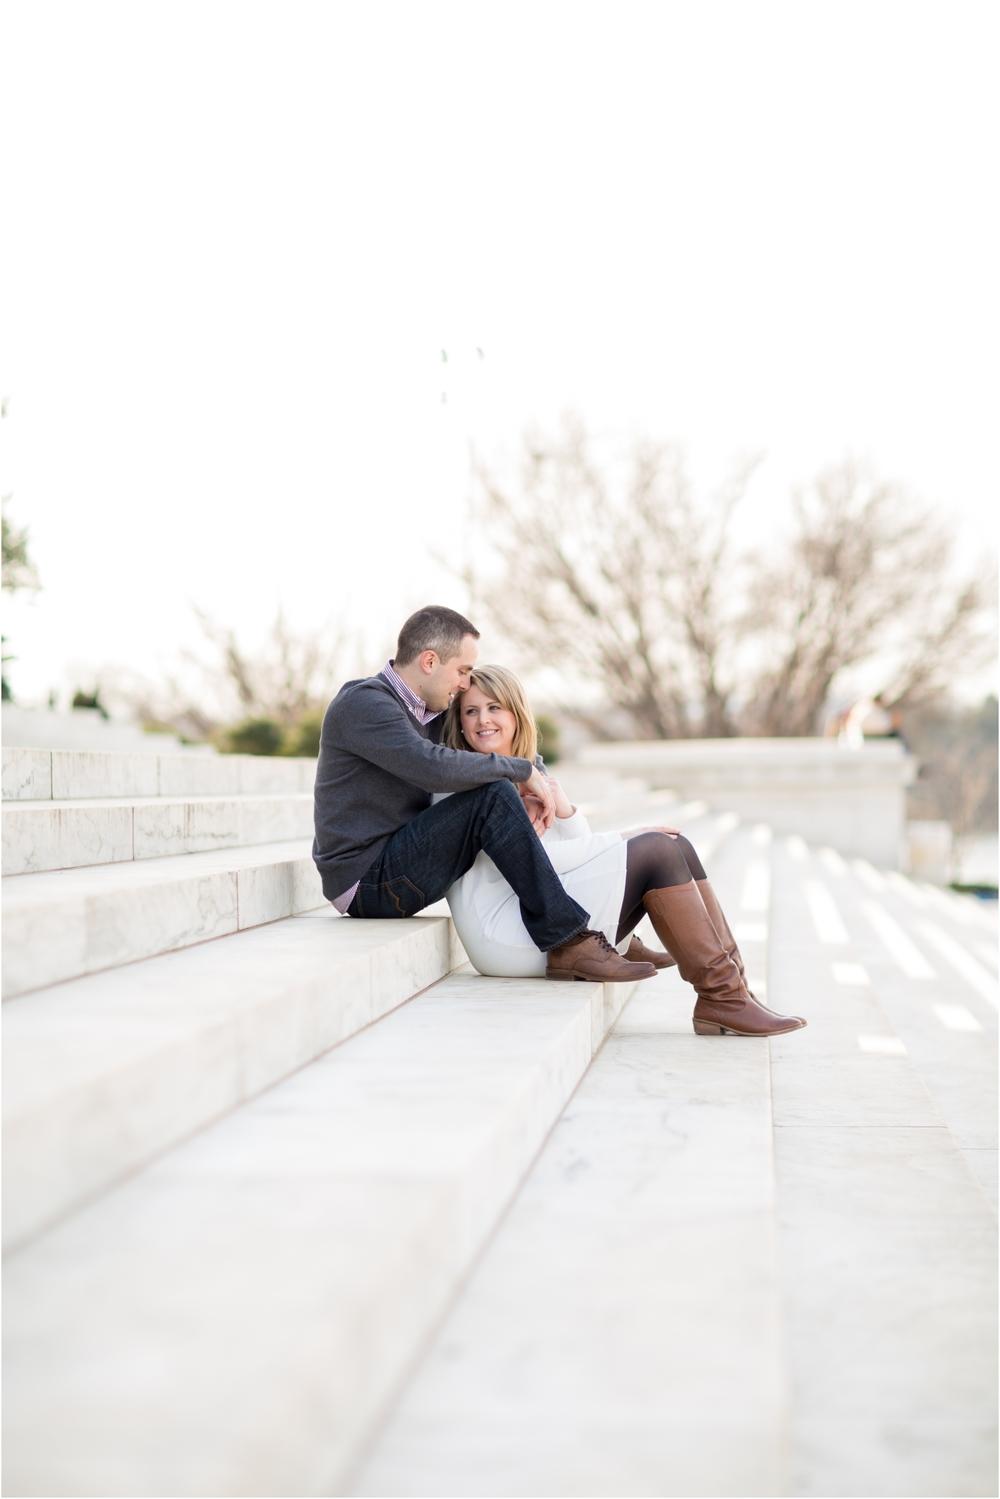 Mary & Nick Engaged-227.jpg